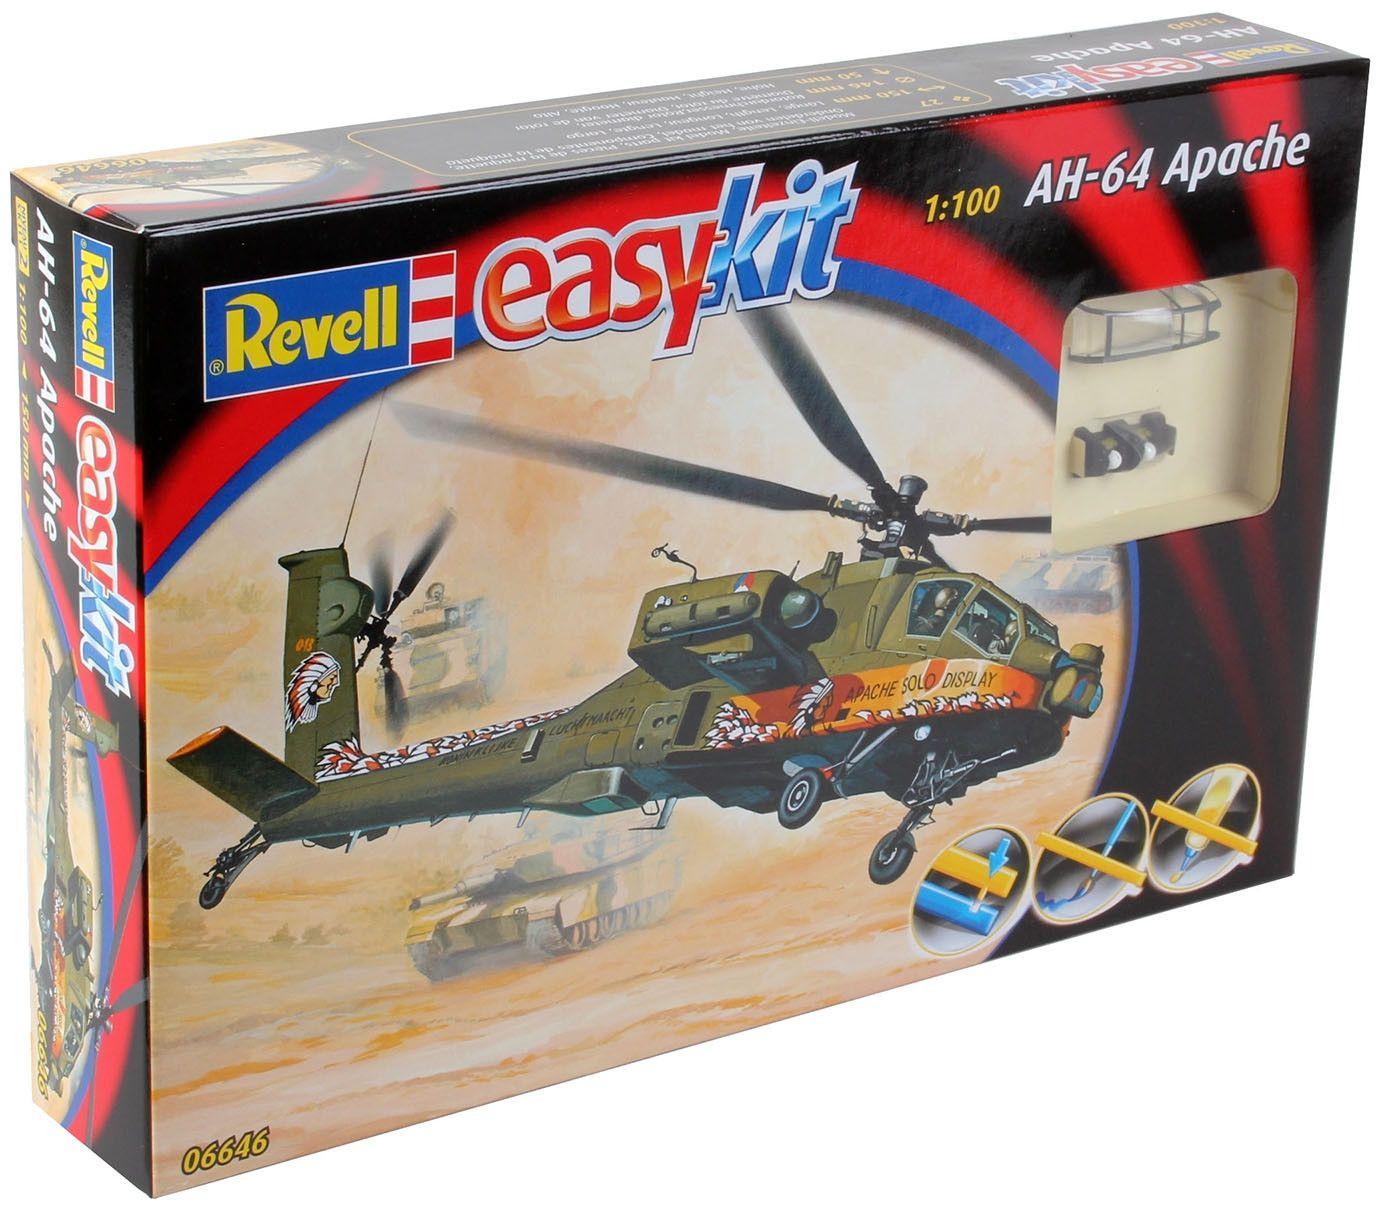 Сглобяем модел на военен хеликоптер Revell Easykit - AH-64 Apache (06646) - 3